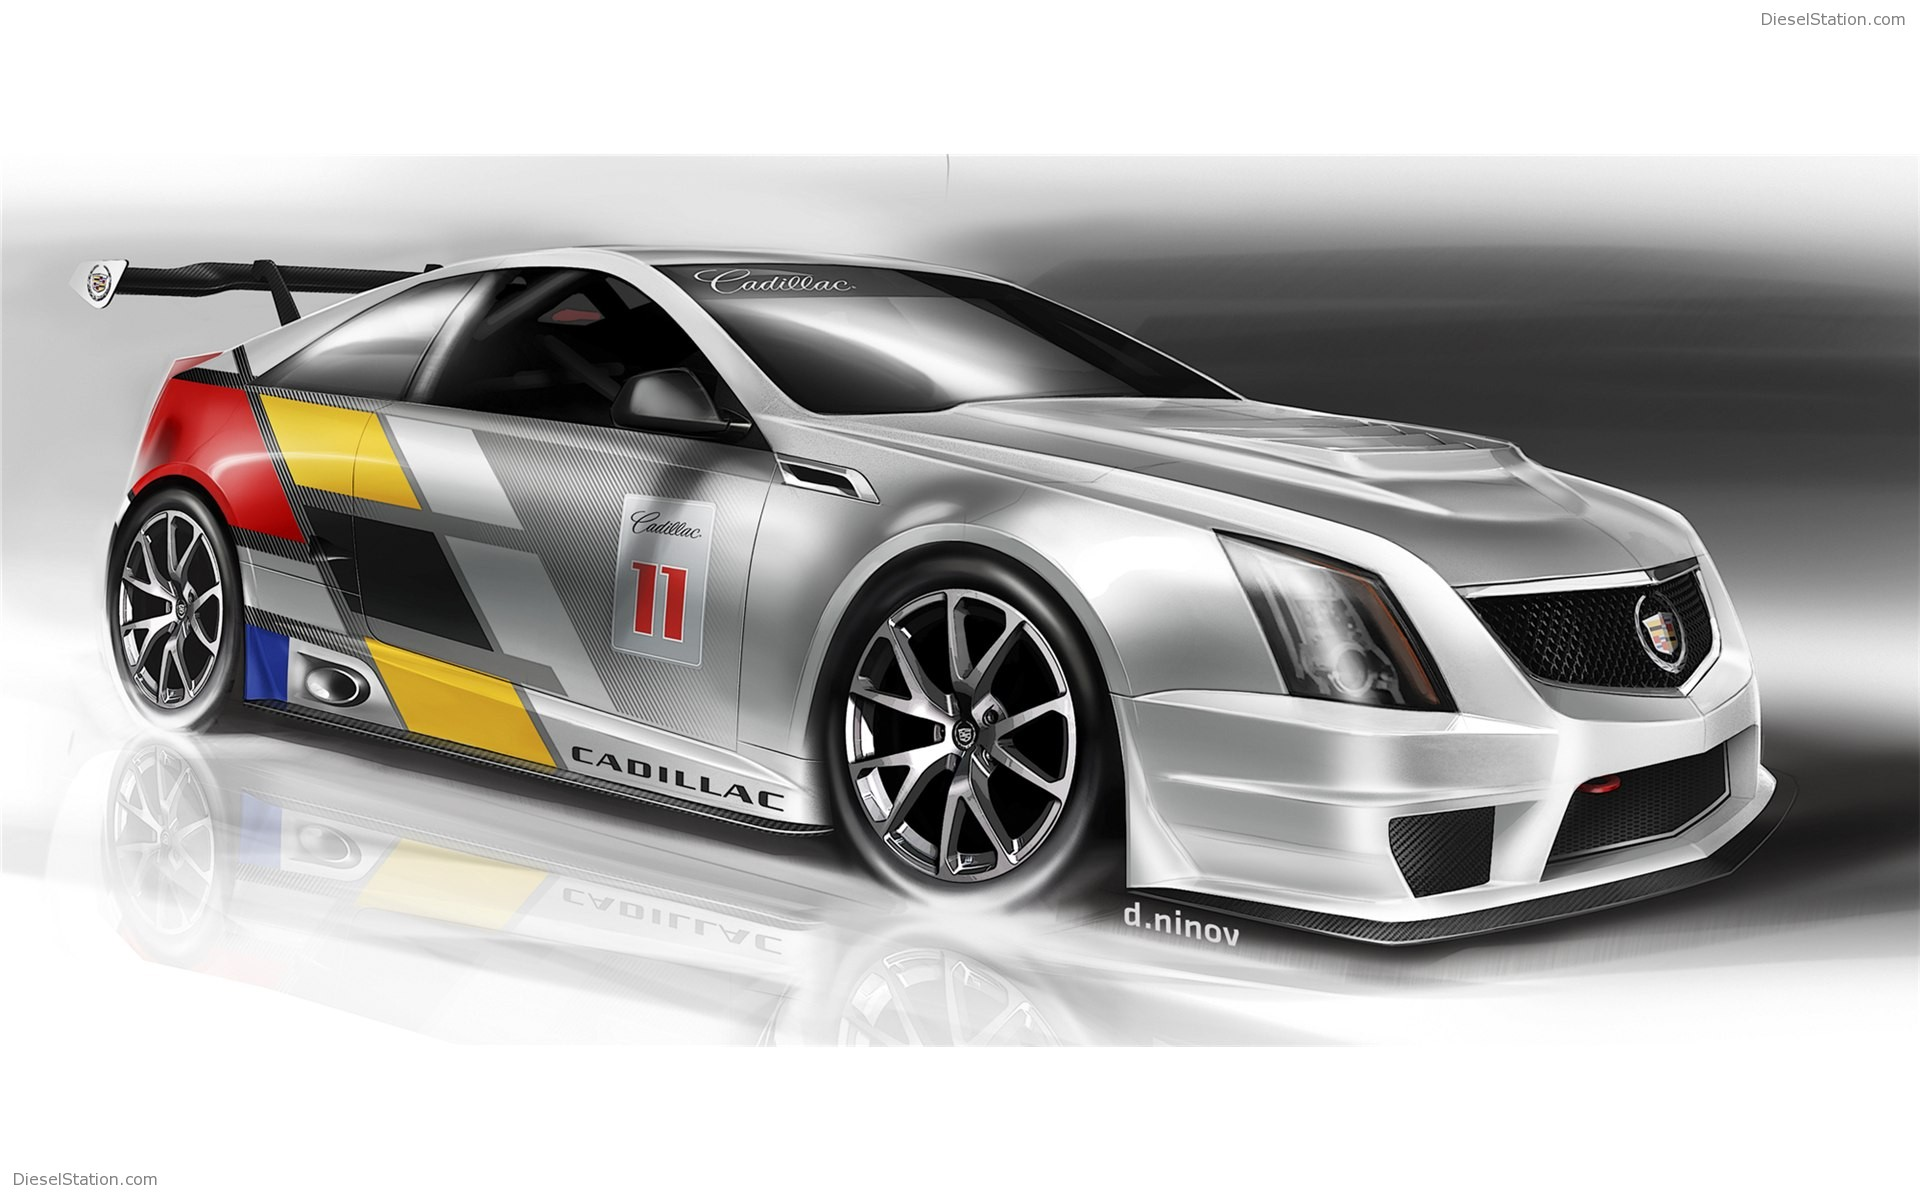 Home Cadillac Cadillac CTS V Coupe Race Car 1920x1200